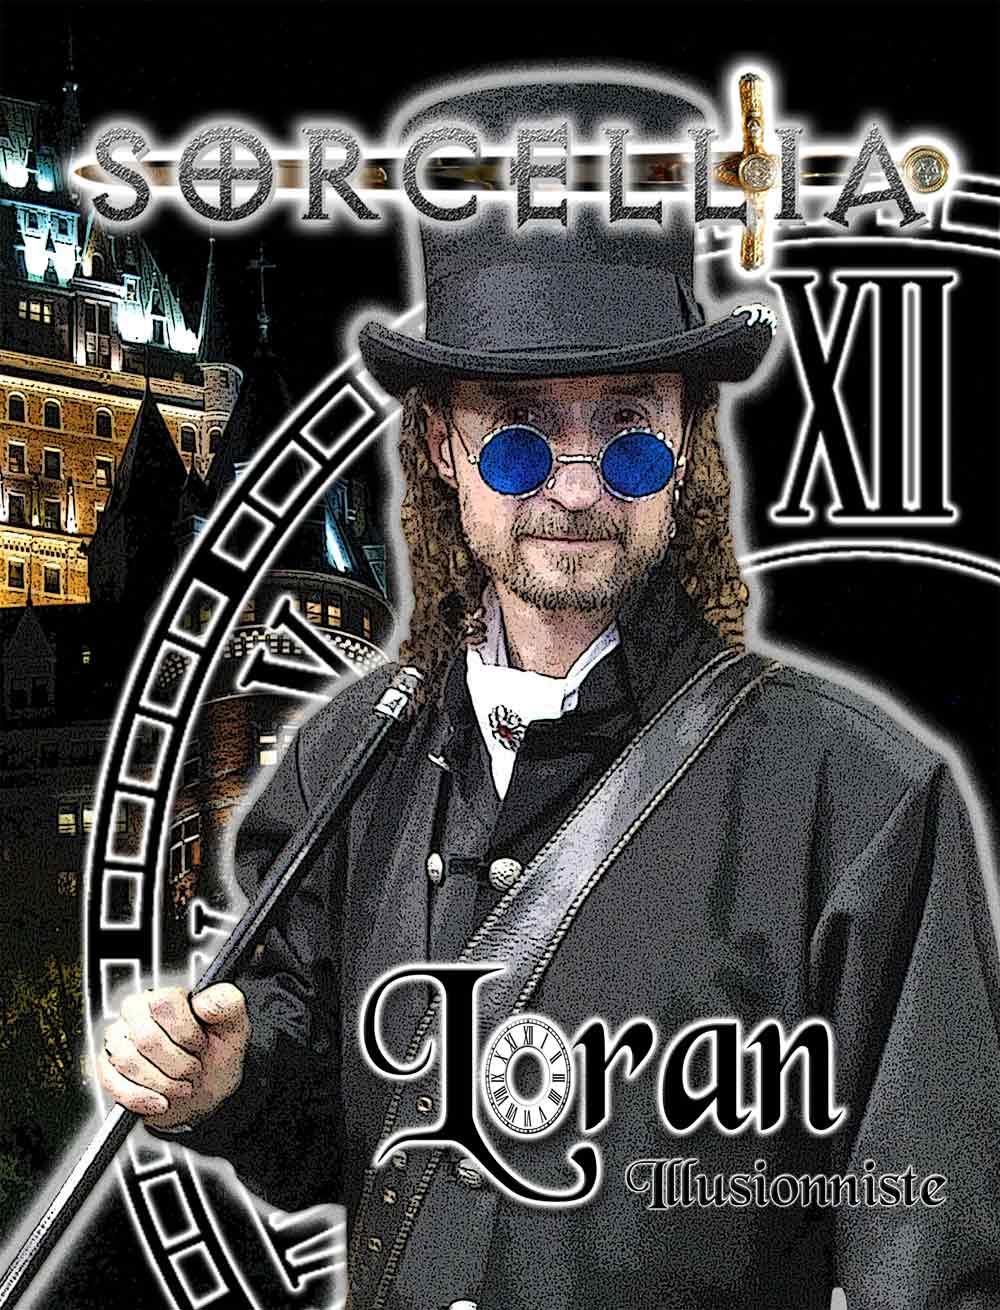 Loran magician illusionist, Sorcellia magic shows